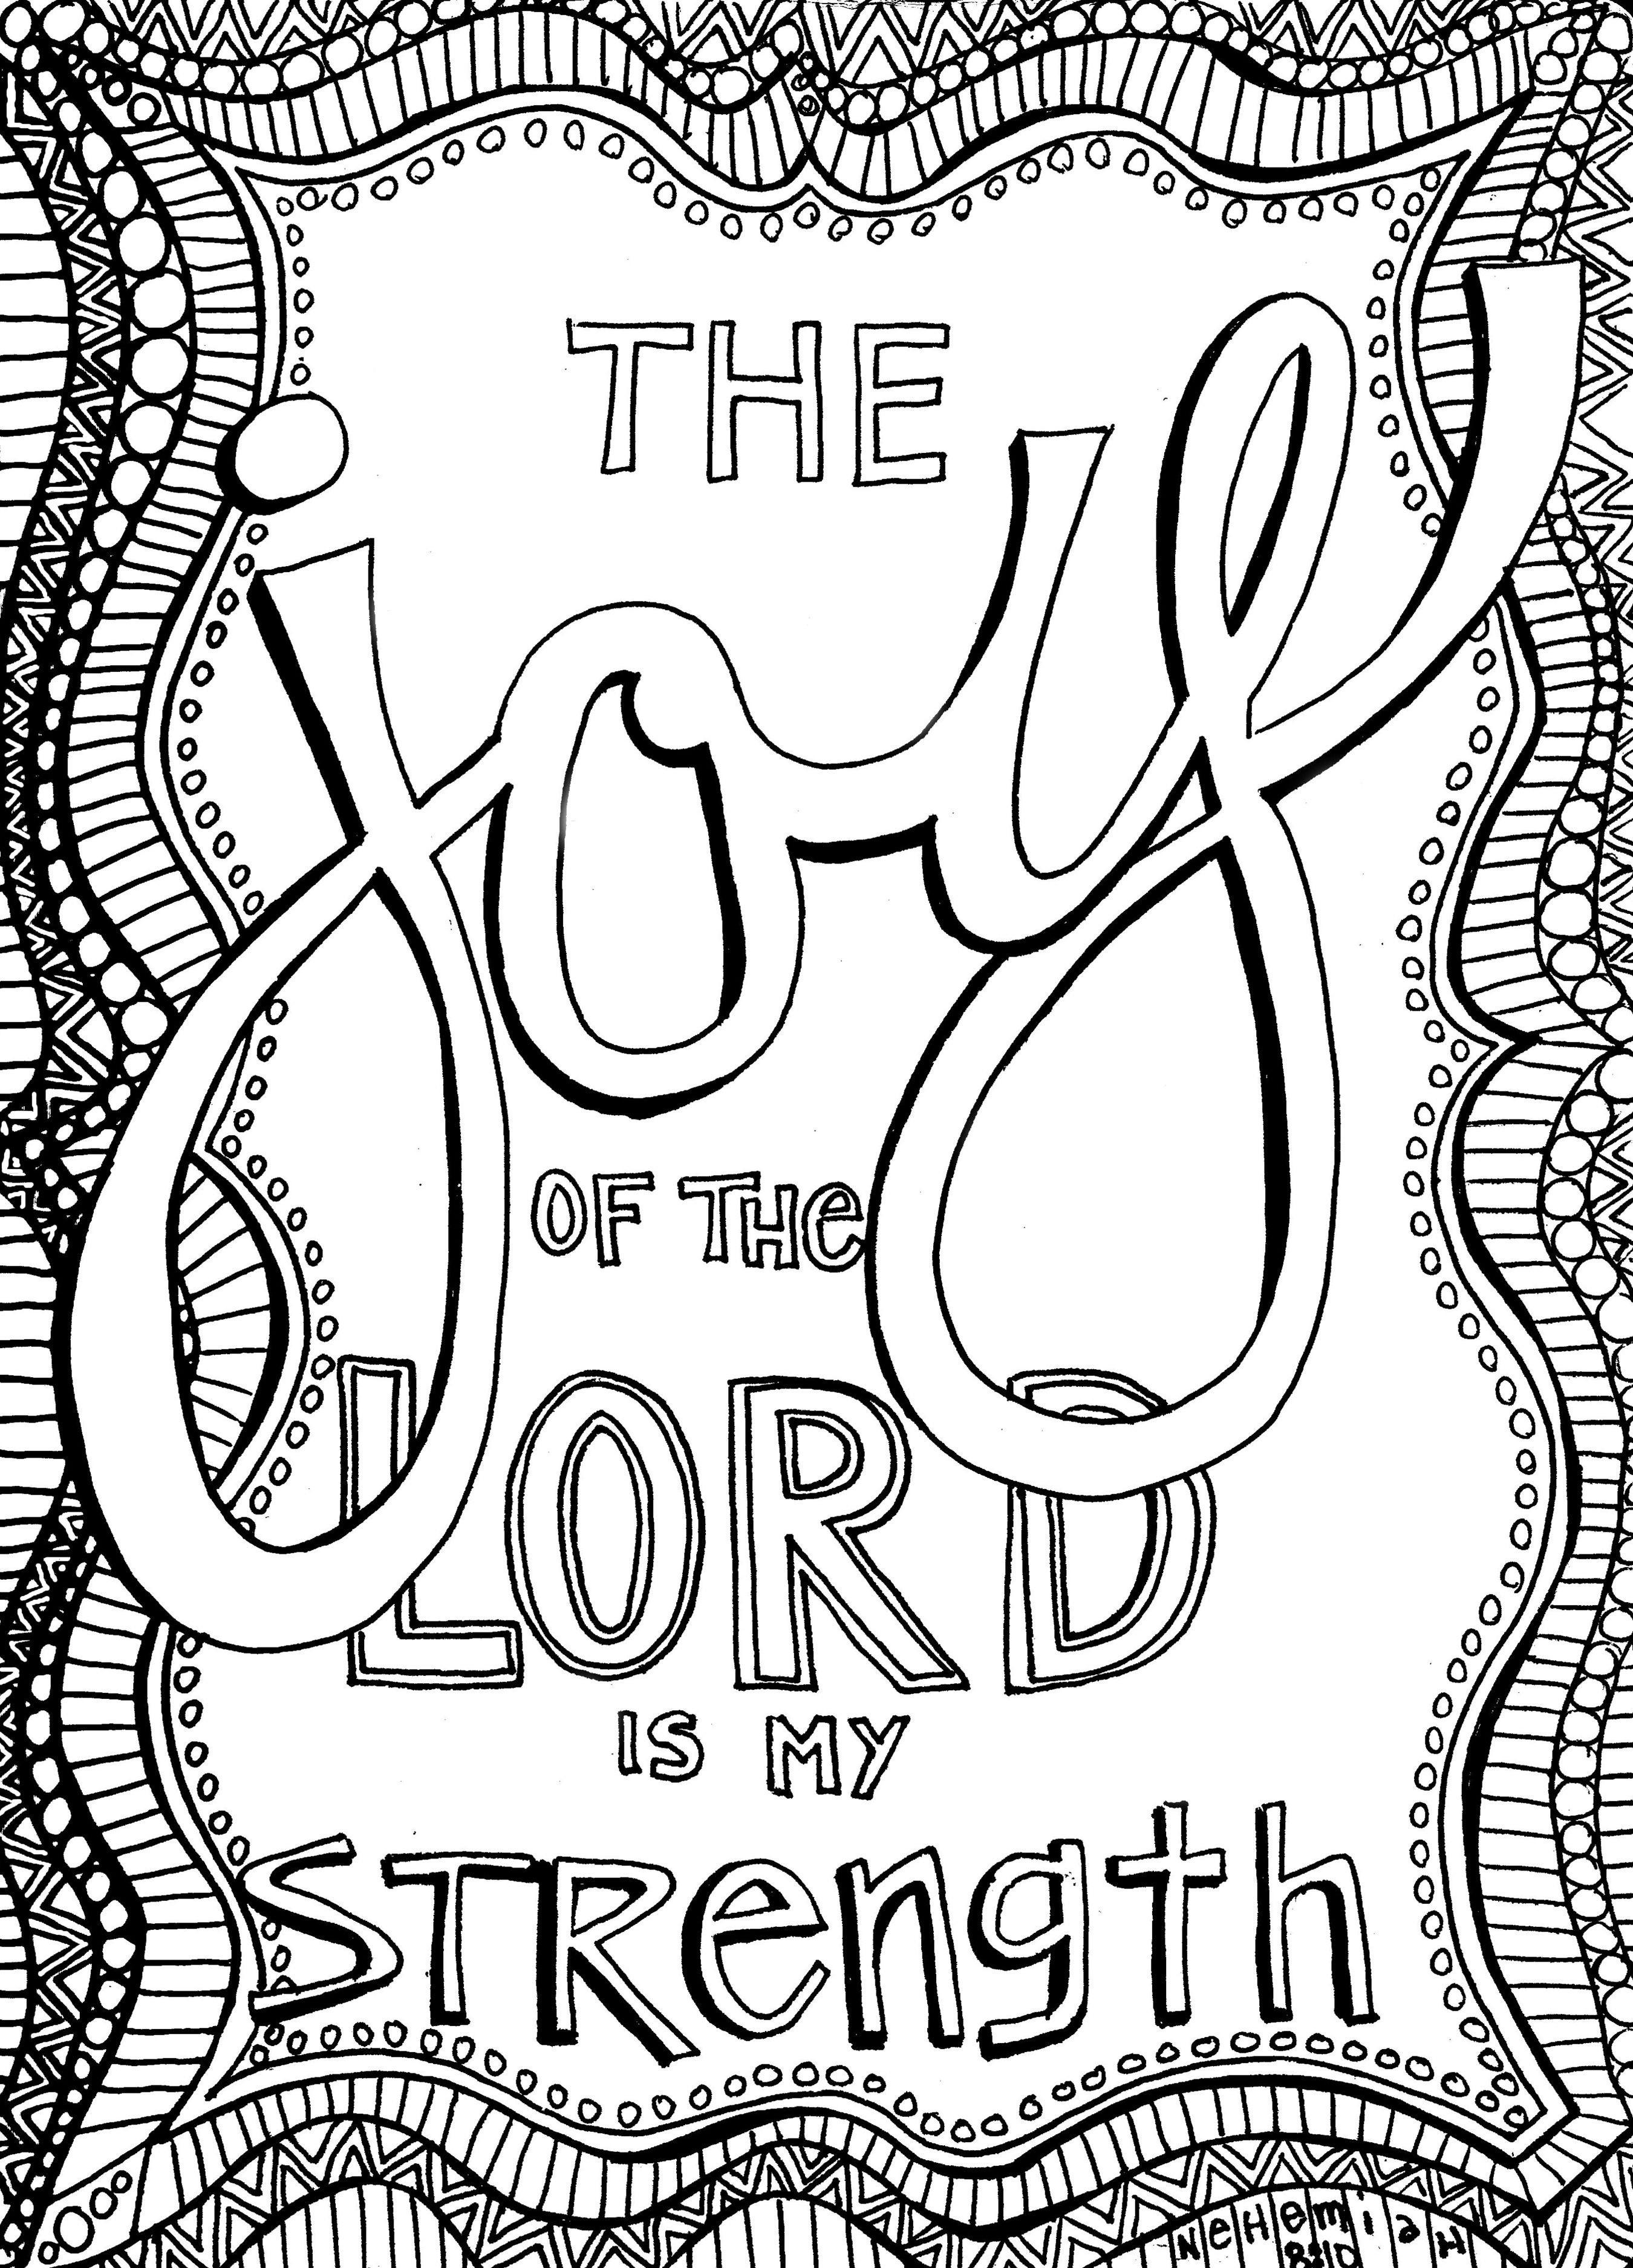 Coloring: Stunning Free Printable Bible Coloring Pages. - Free Printable Bible Coloring Pages